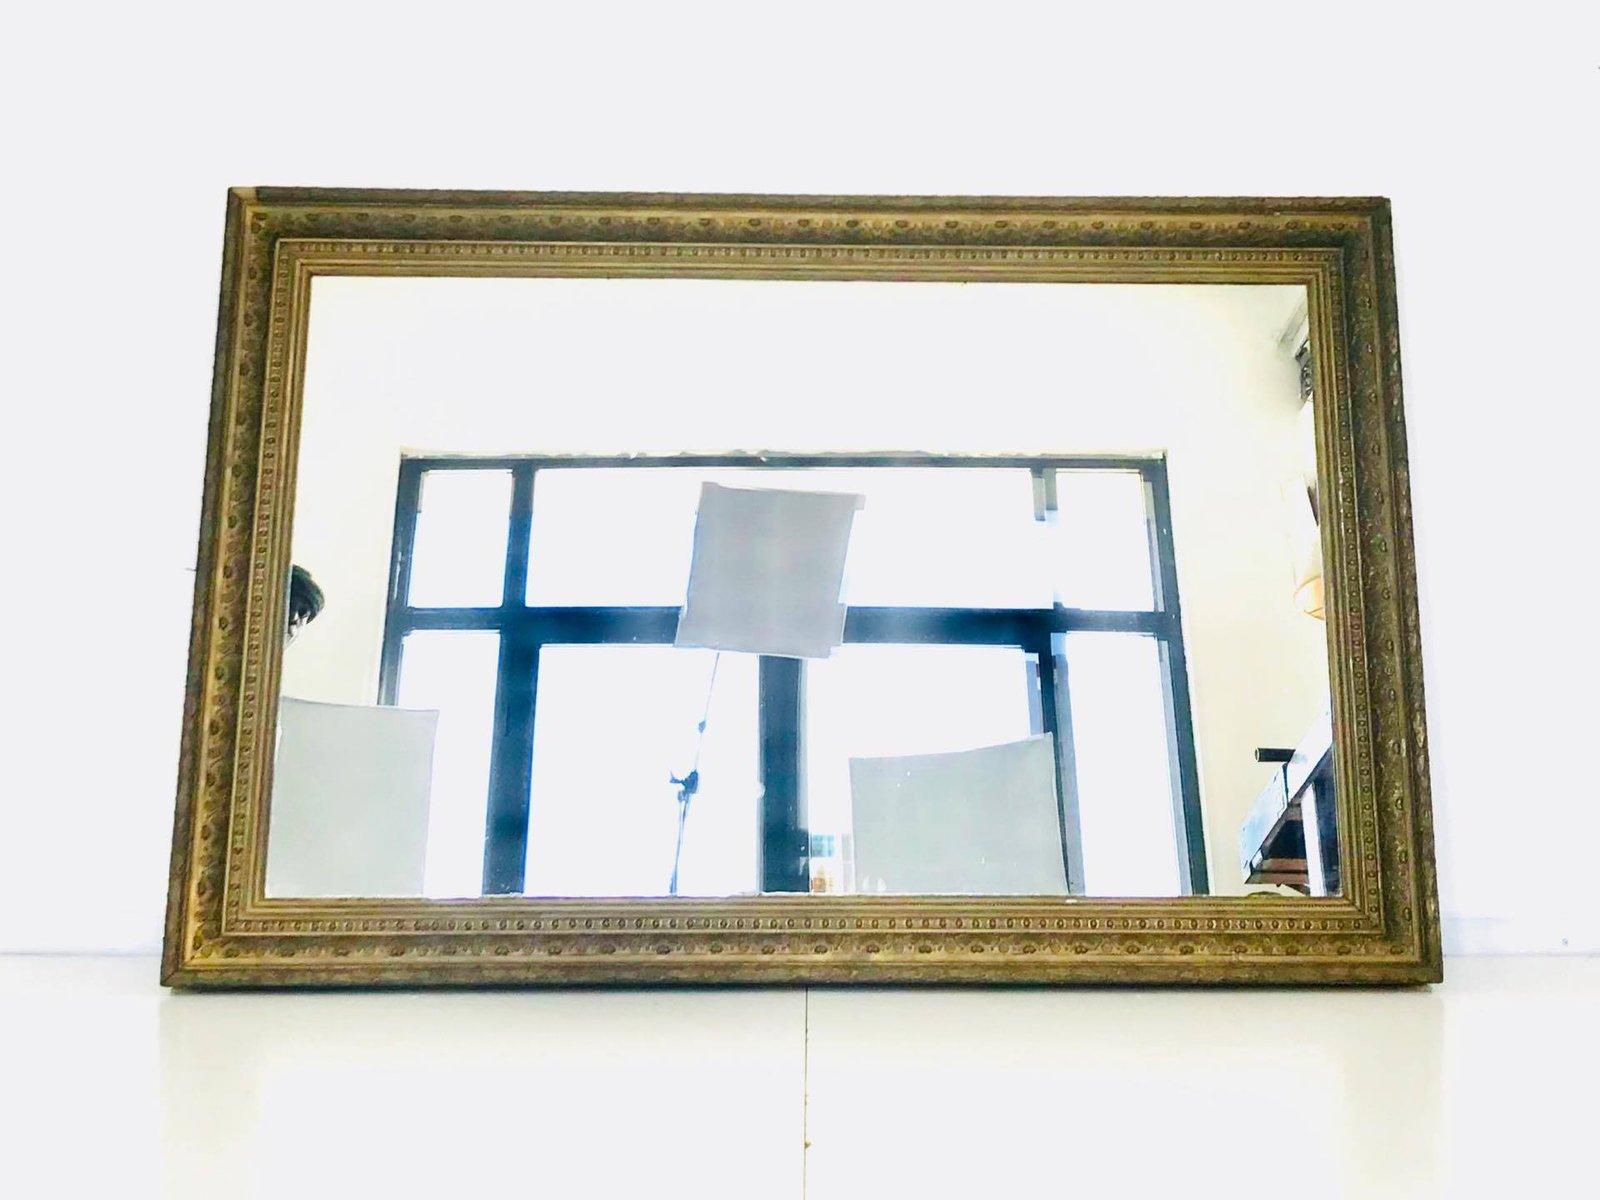 vintage spiegel mit goldfarbenem holzrahmen bei pamono kaufen. Black Bedroom Furniture Sets. Home Design Ideas